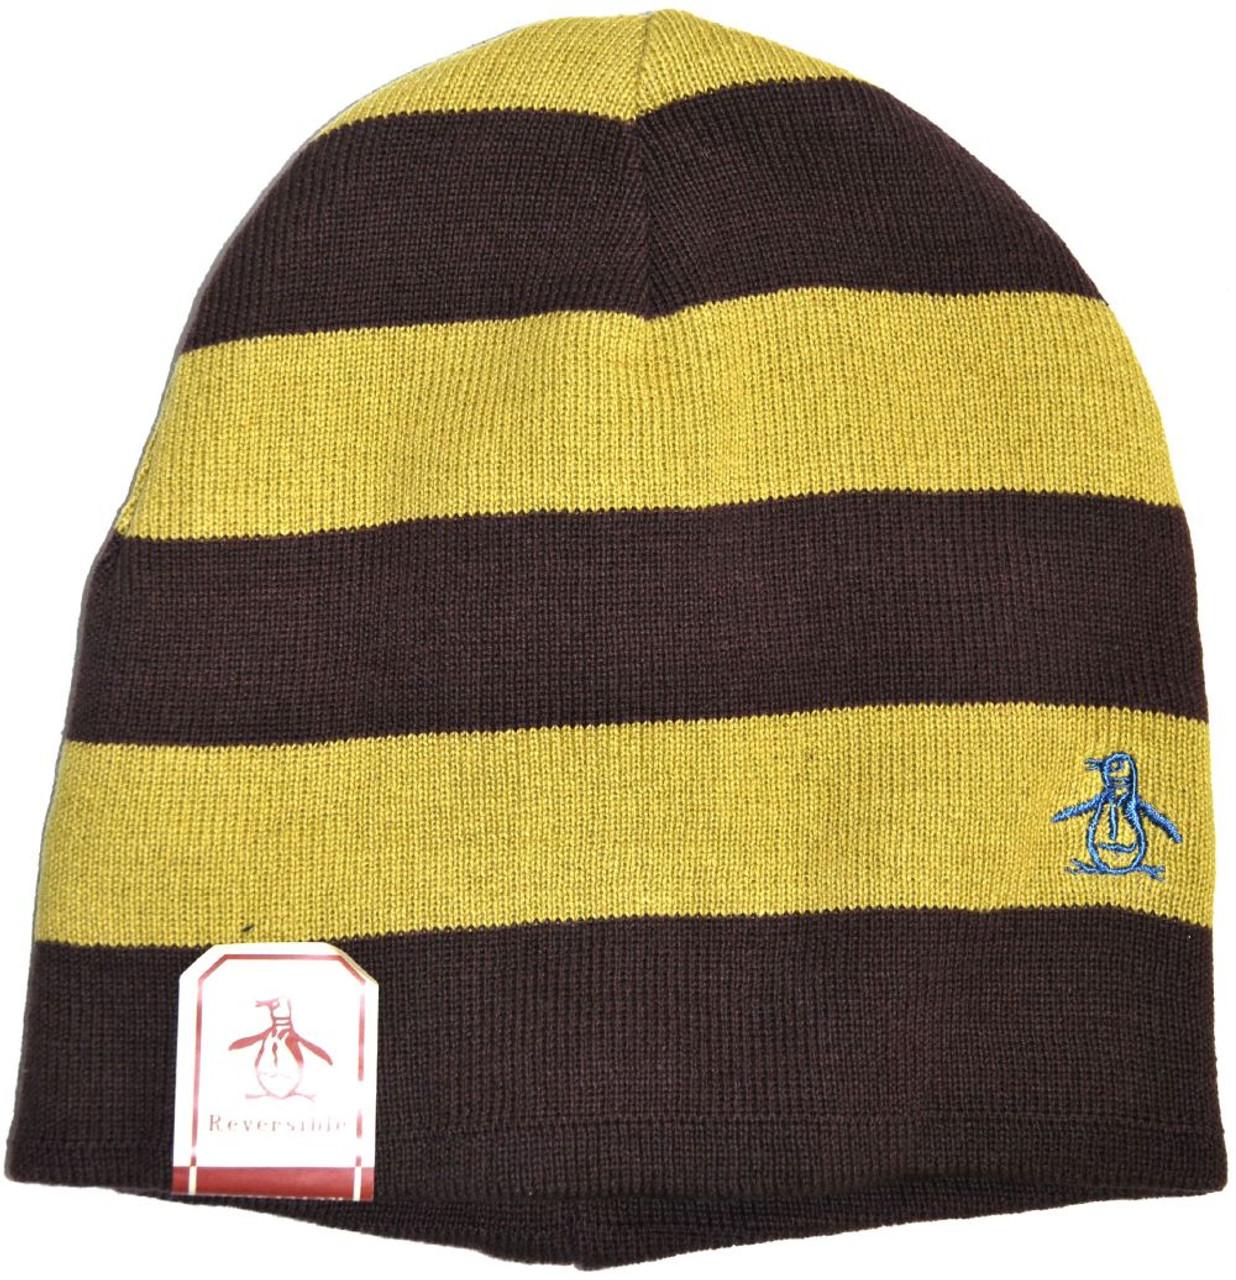 Original Penguin by Munsingwear Hat - Mr. Flip Reversible Ski Cap ... 67c37c78b95